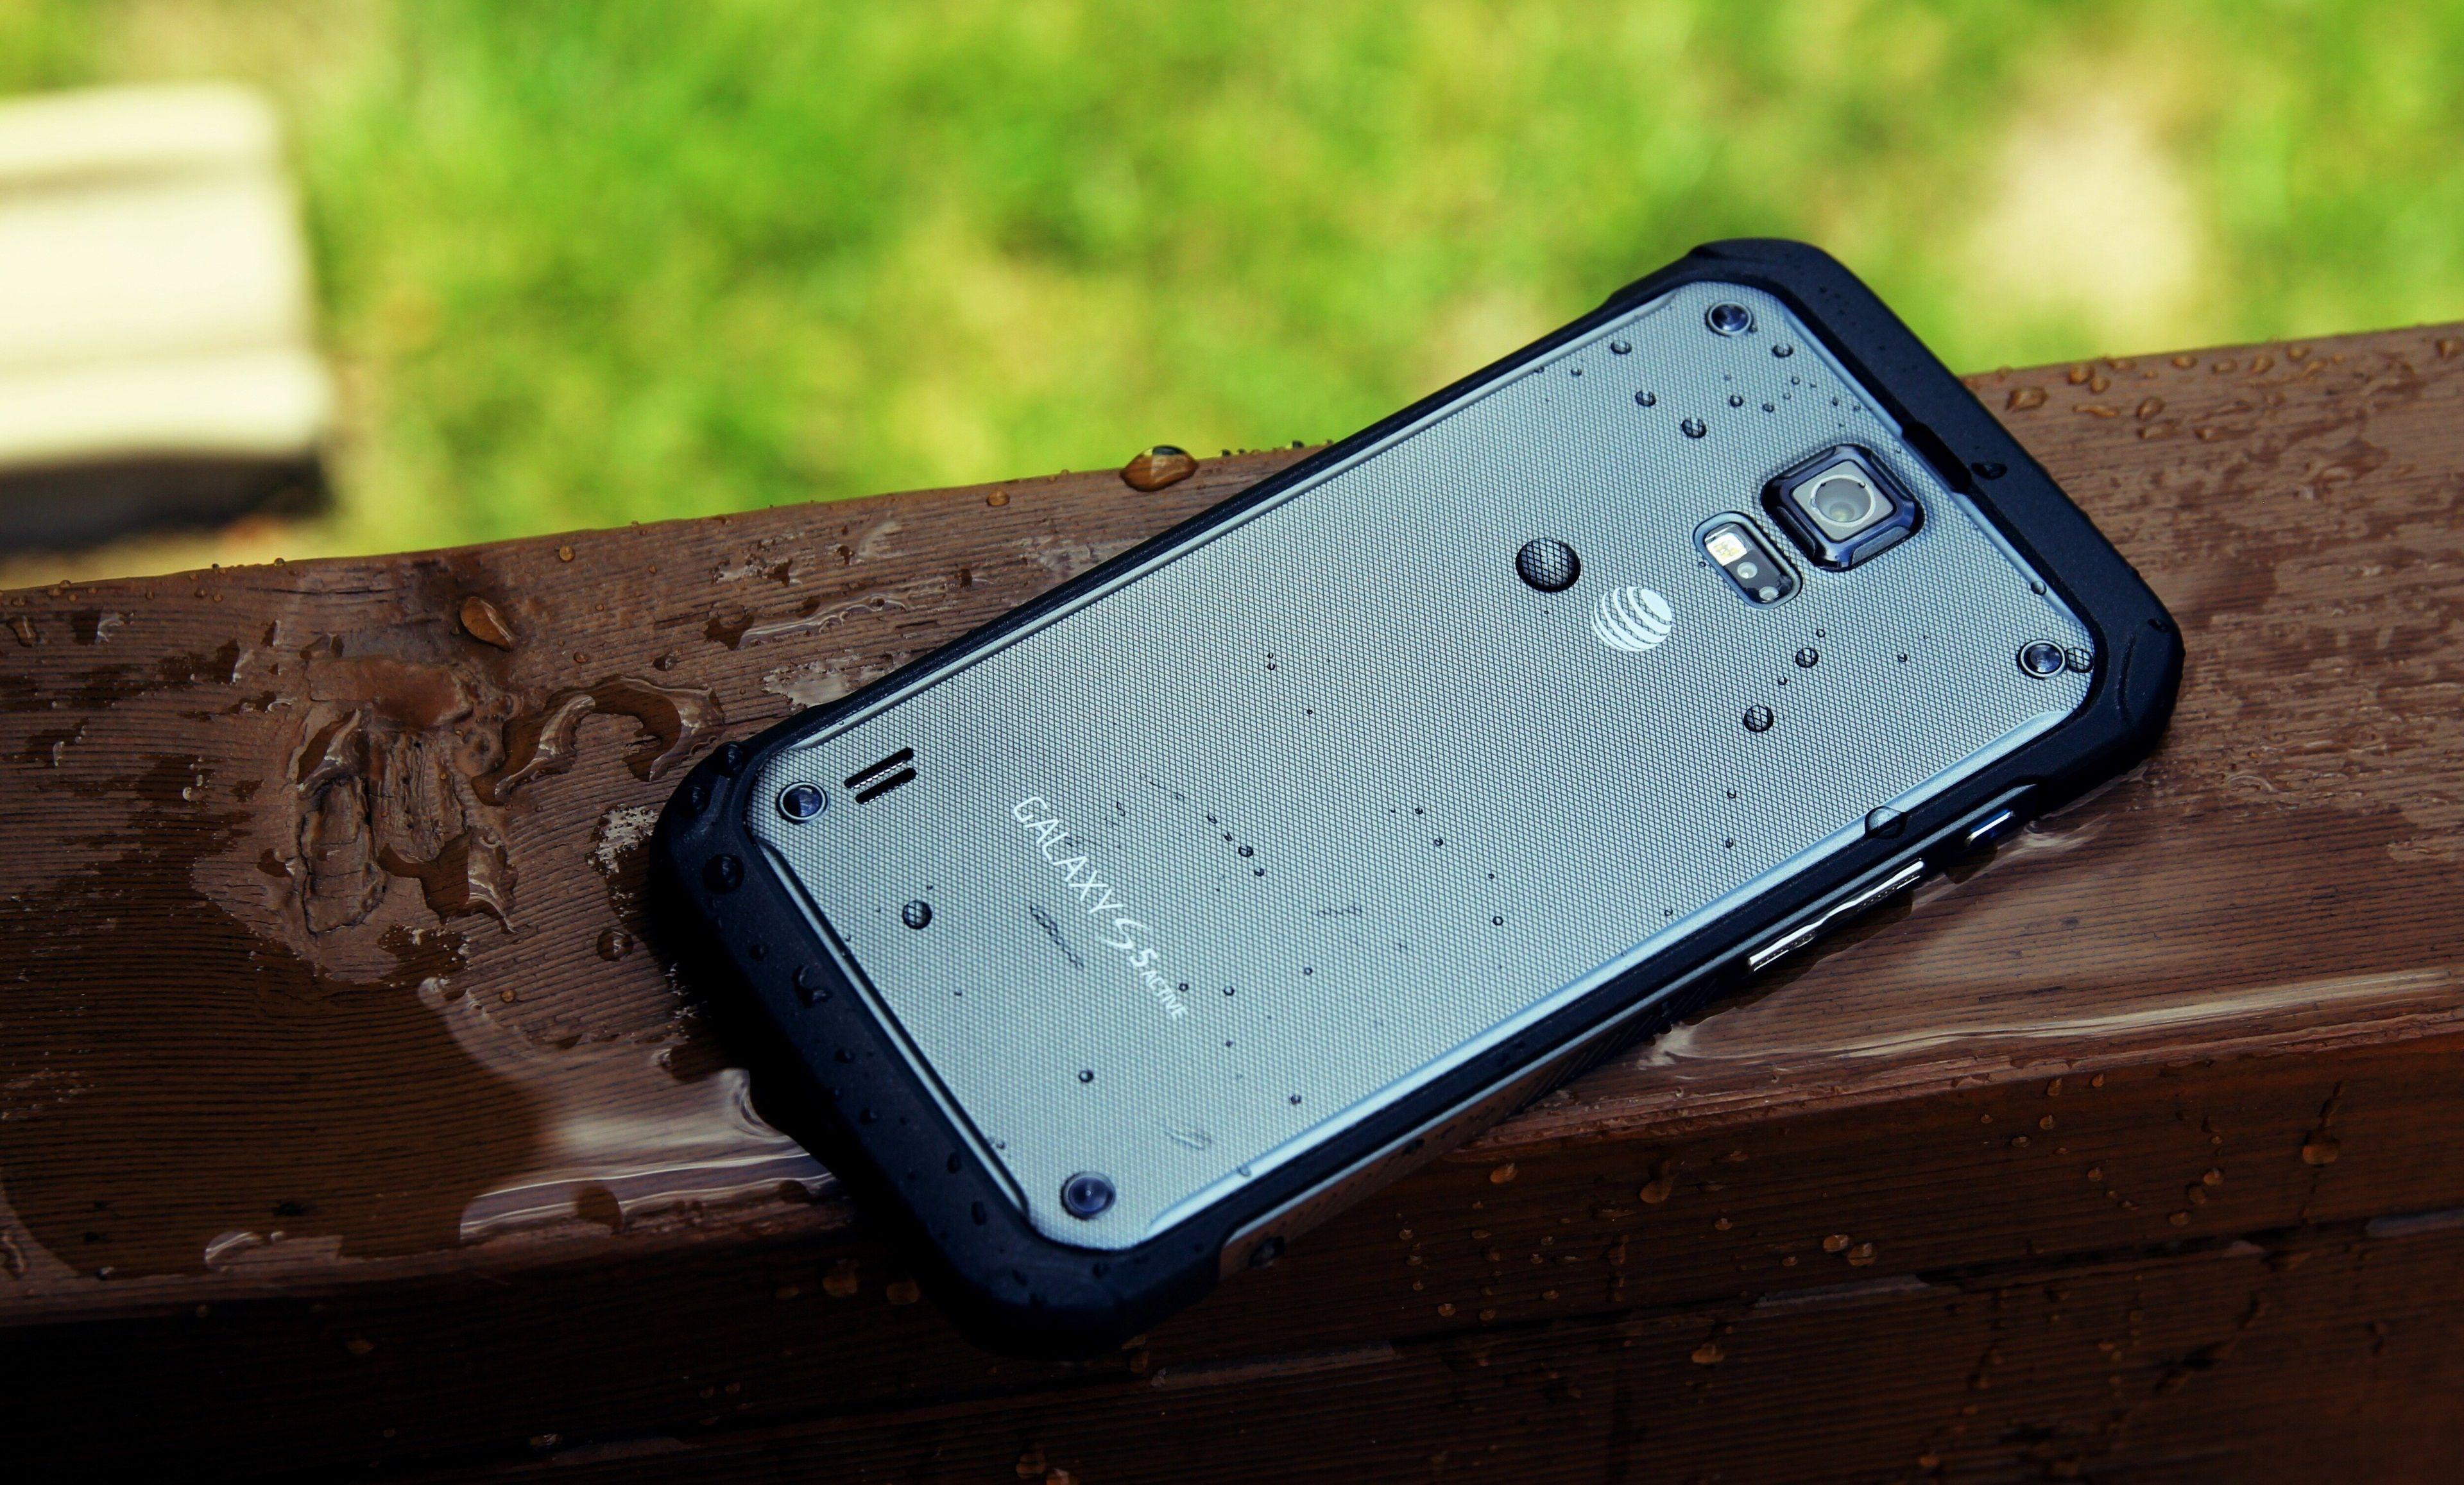 3840x2314 Samsung Galaxy S6 Active 4k High Resolution